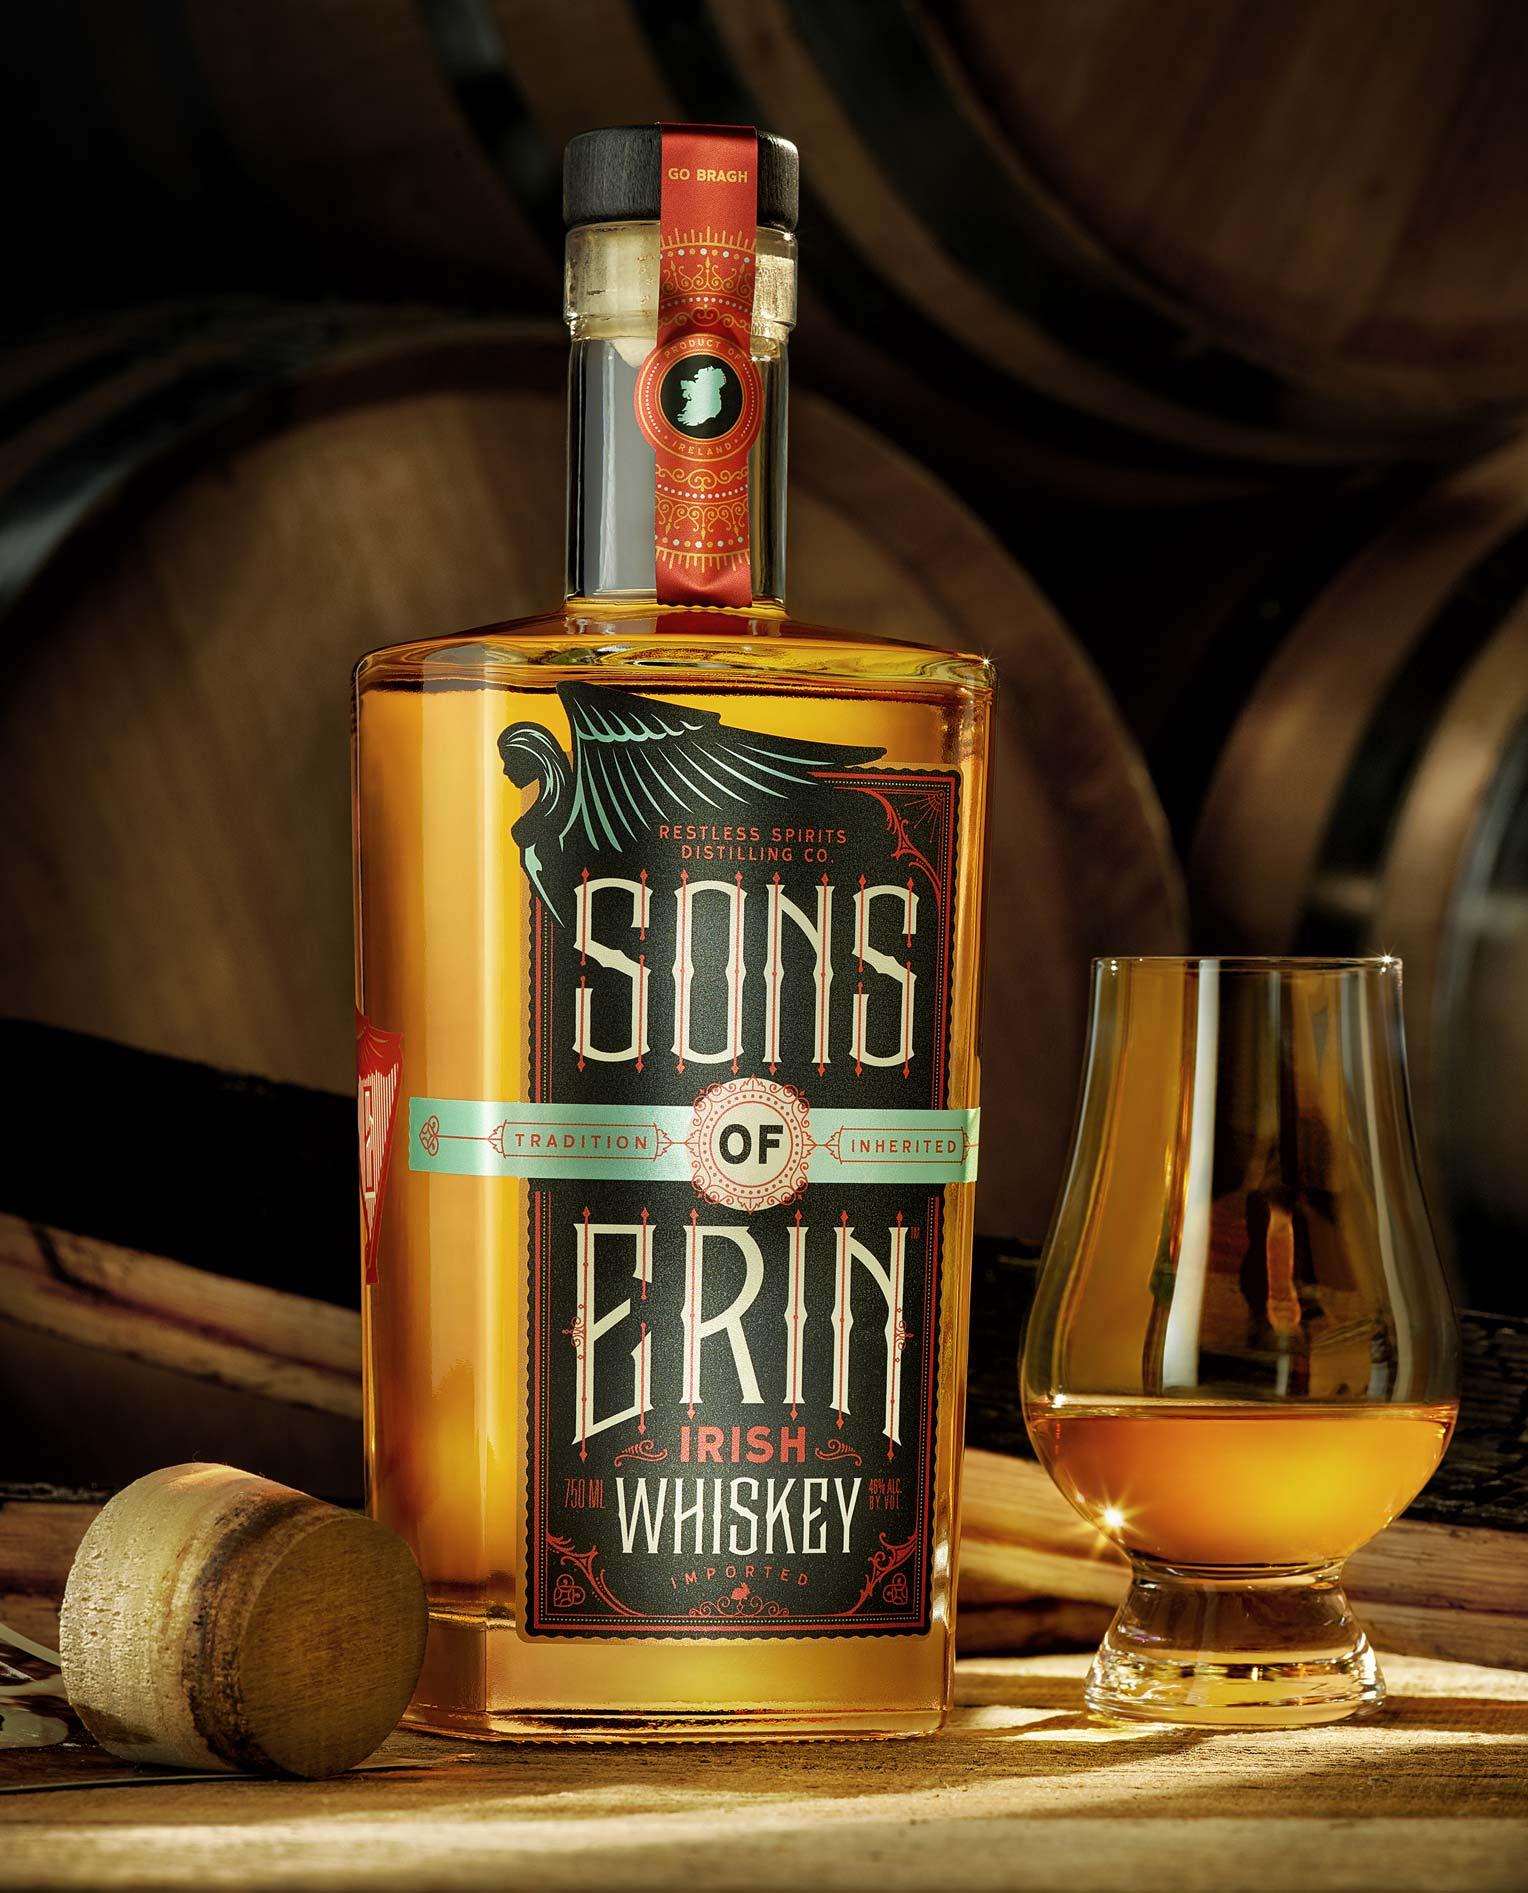 rs-sons-of-erin-irish-whiskey-dominant-photo